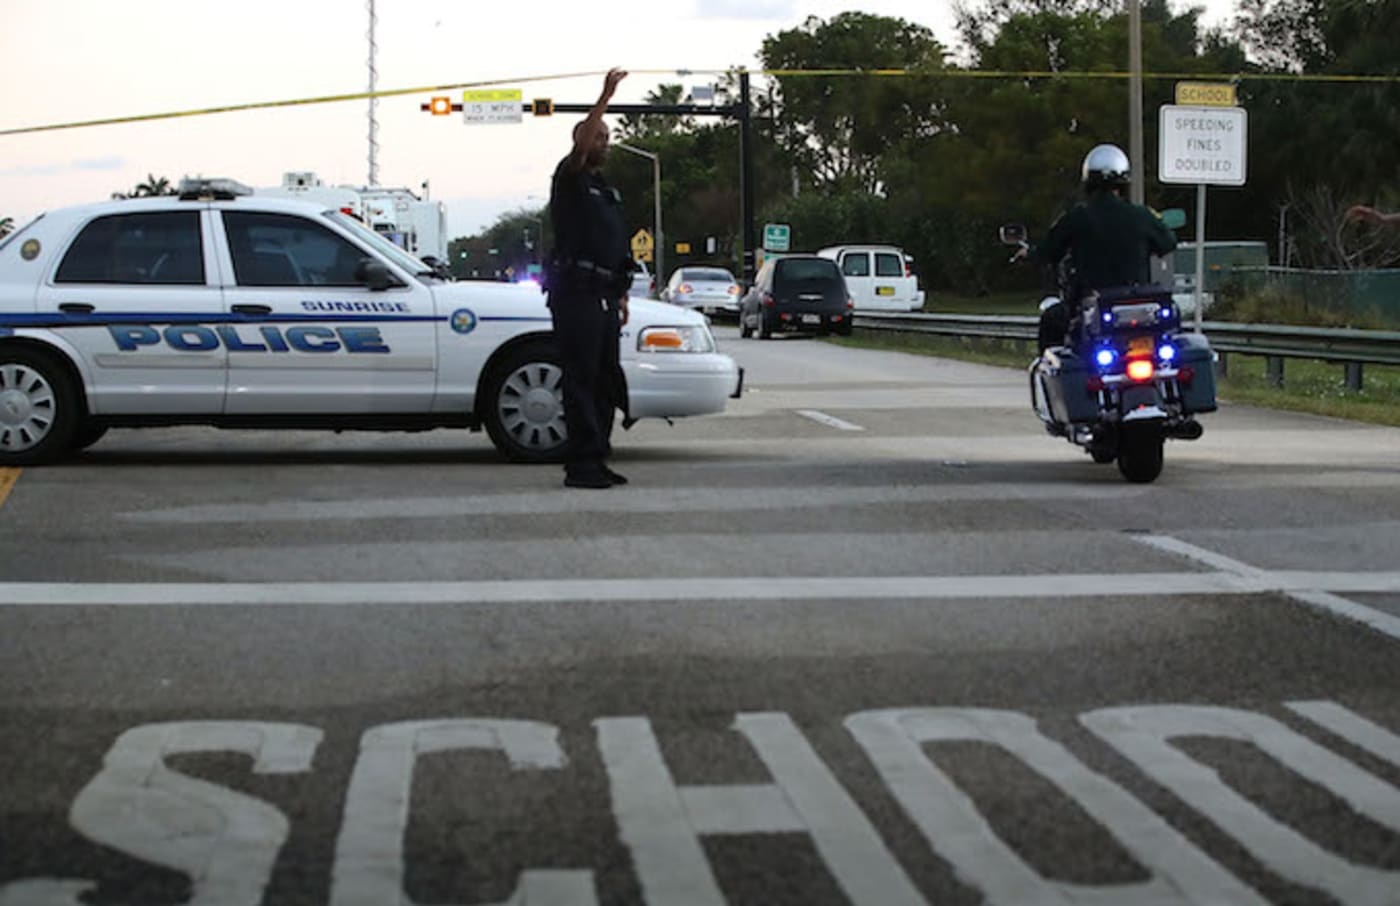 Police in Parkland Florida